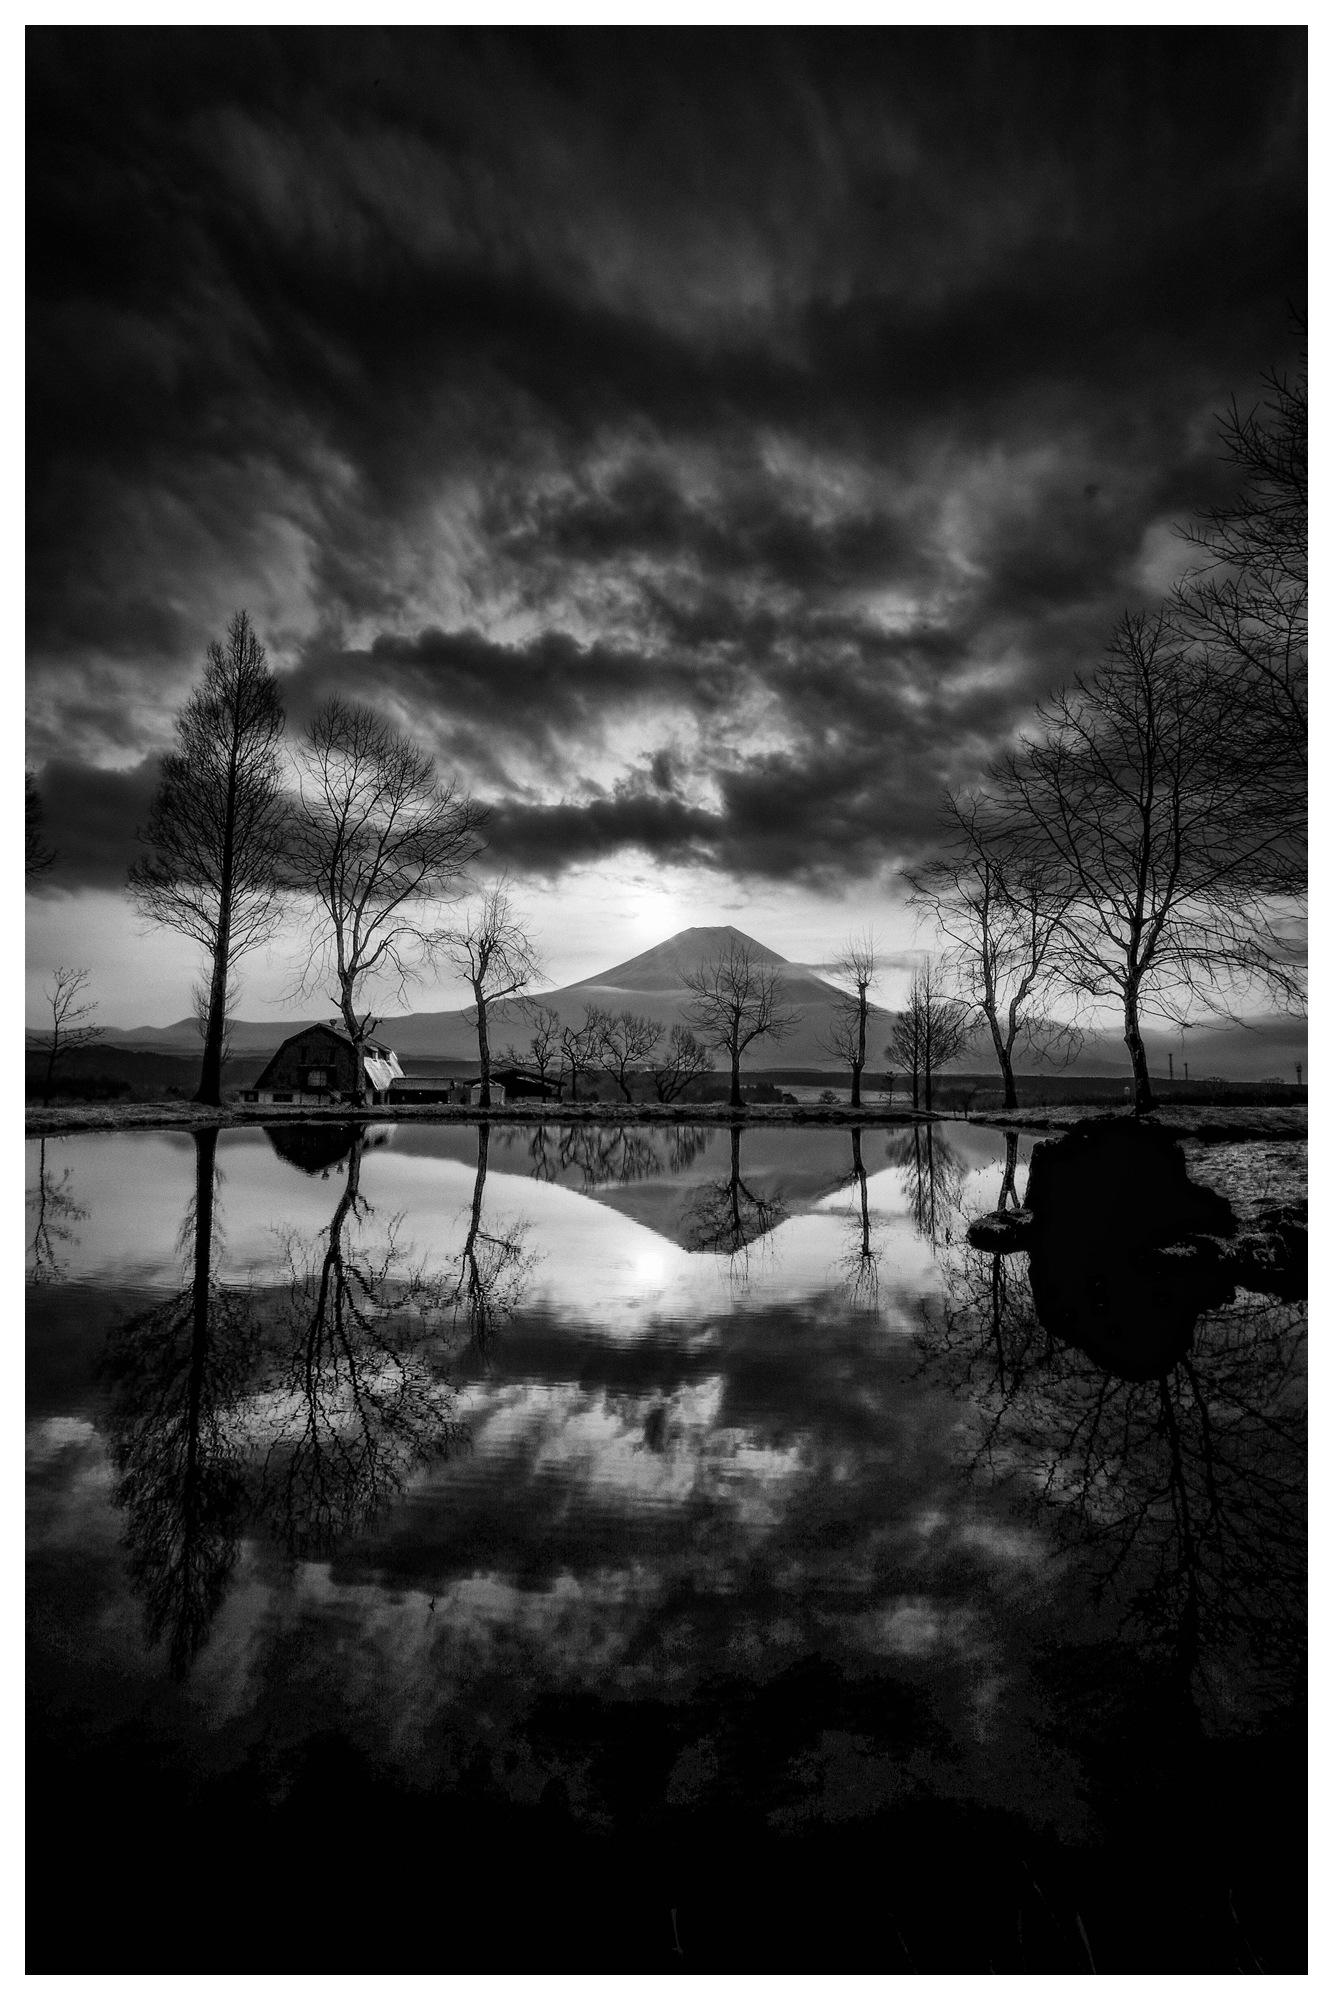 Untitled by Yuichi Harada